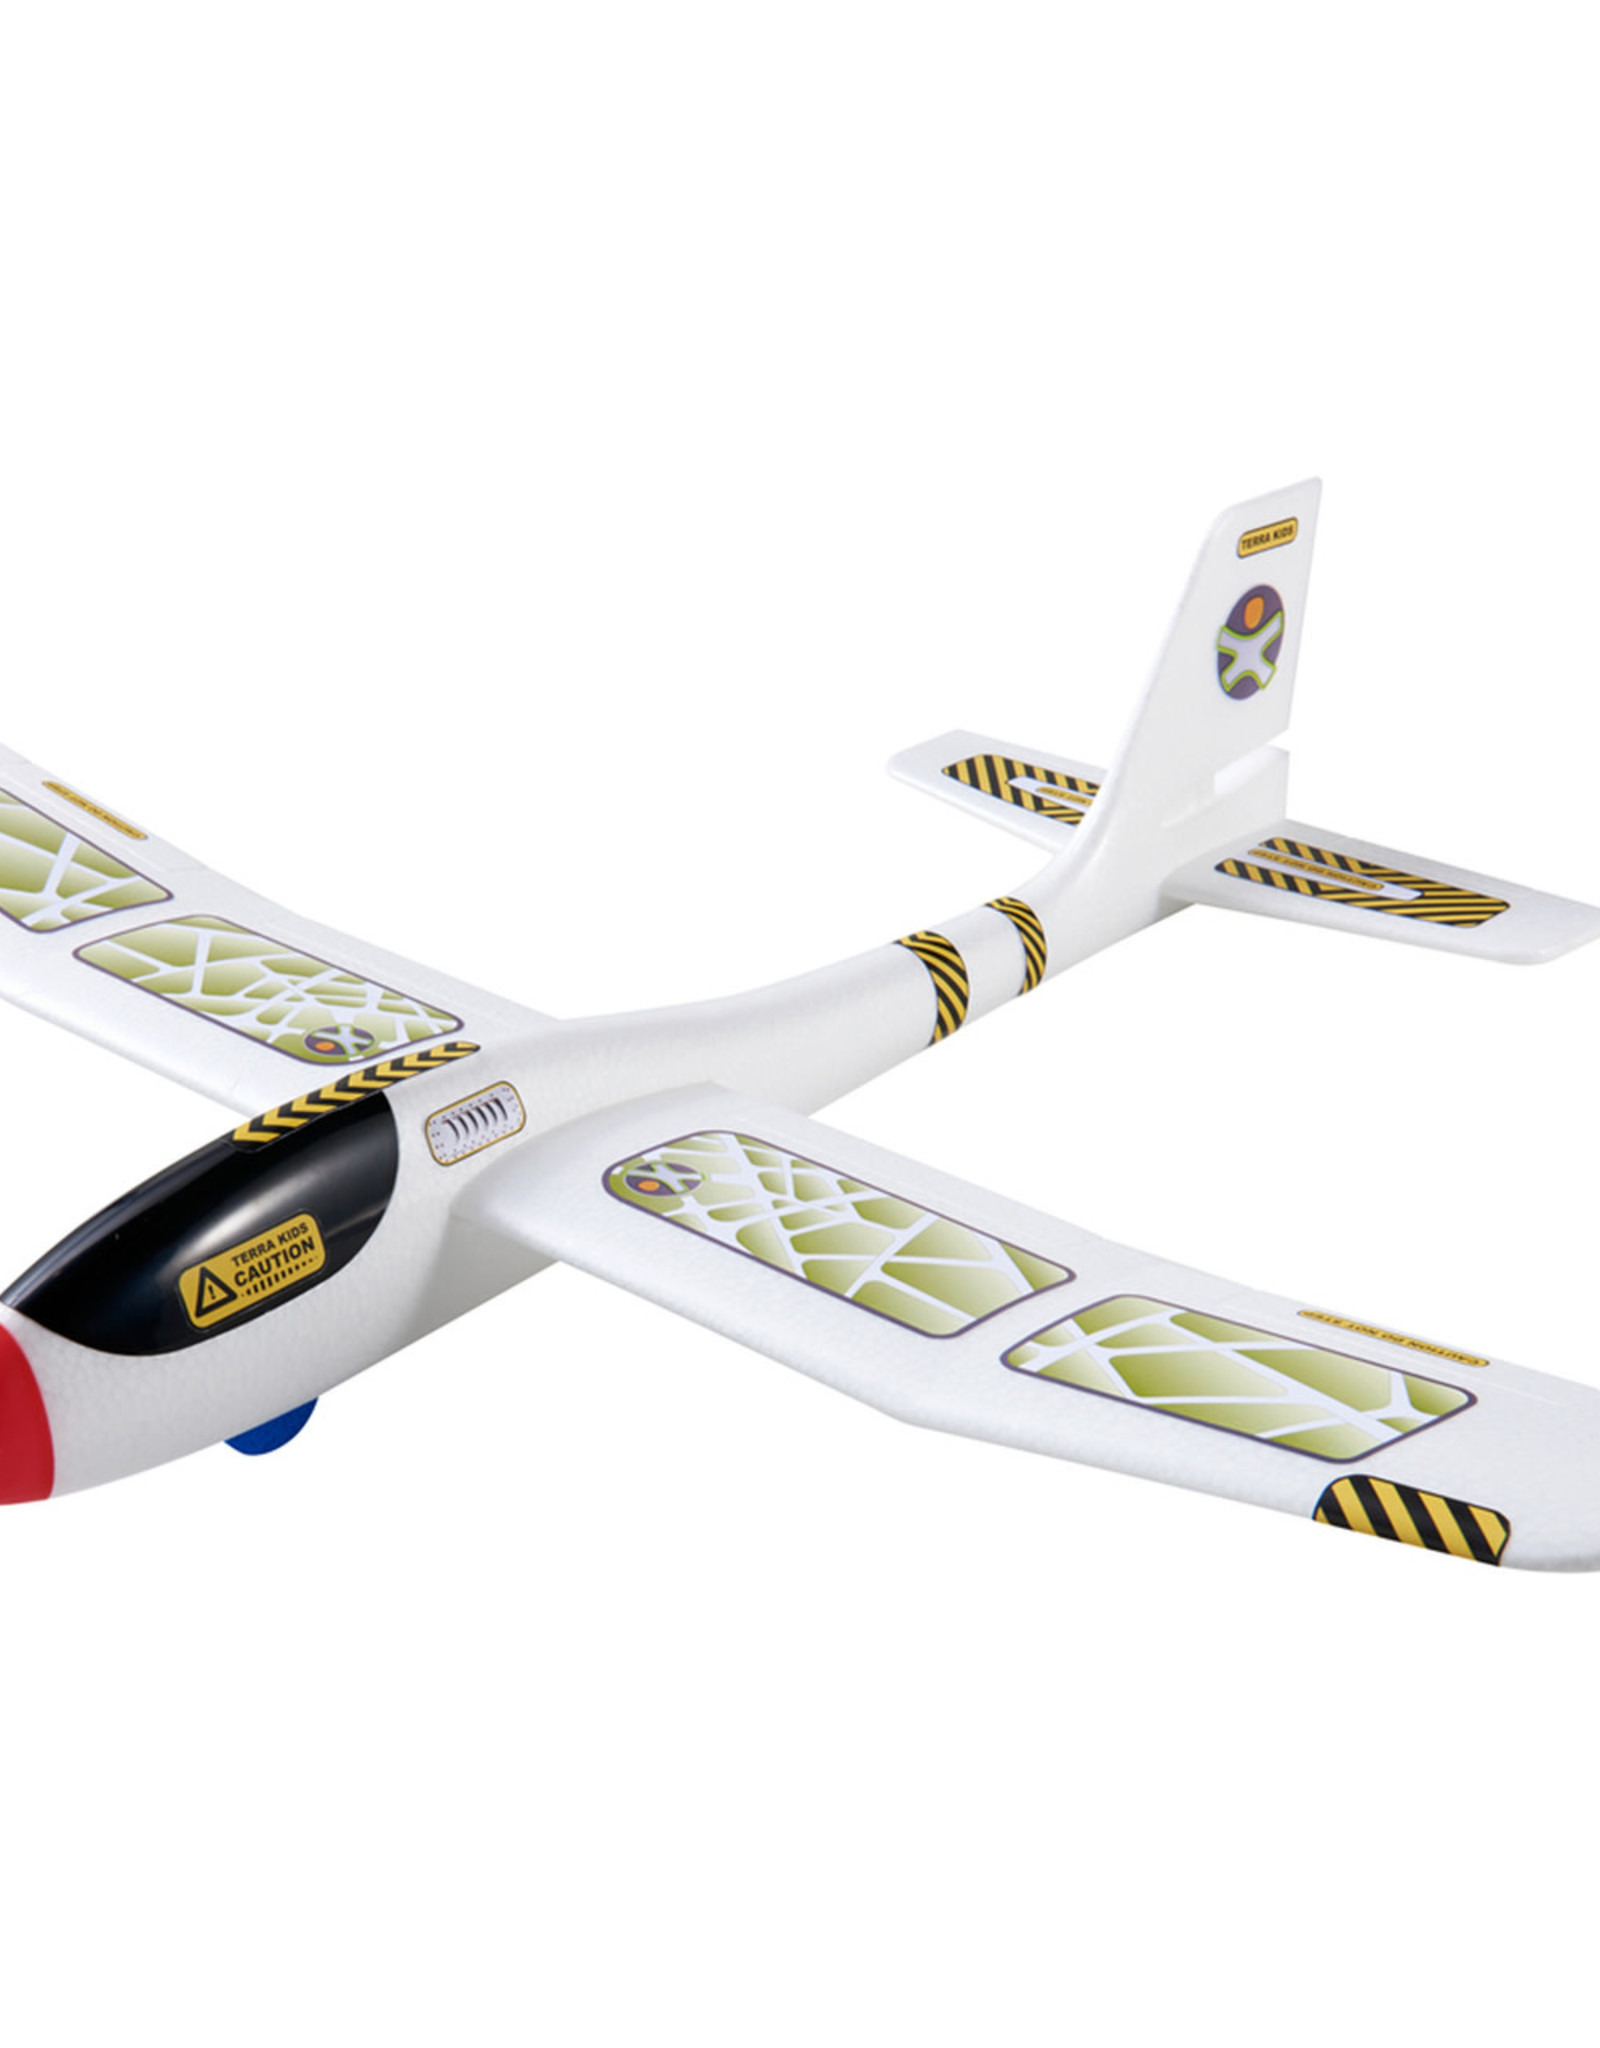 Haba Maxi Hand Glider